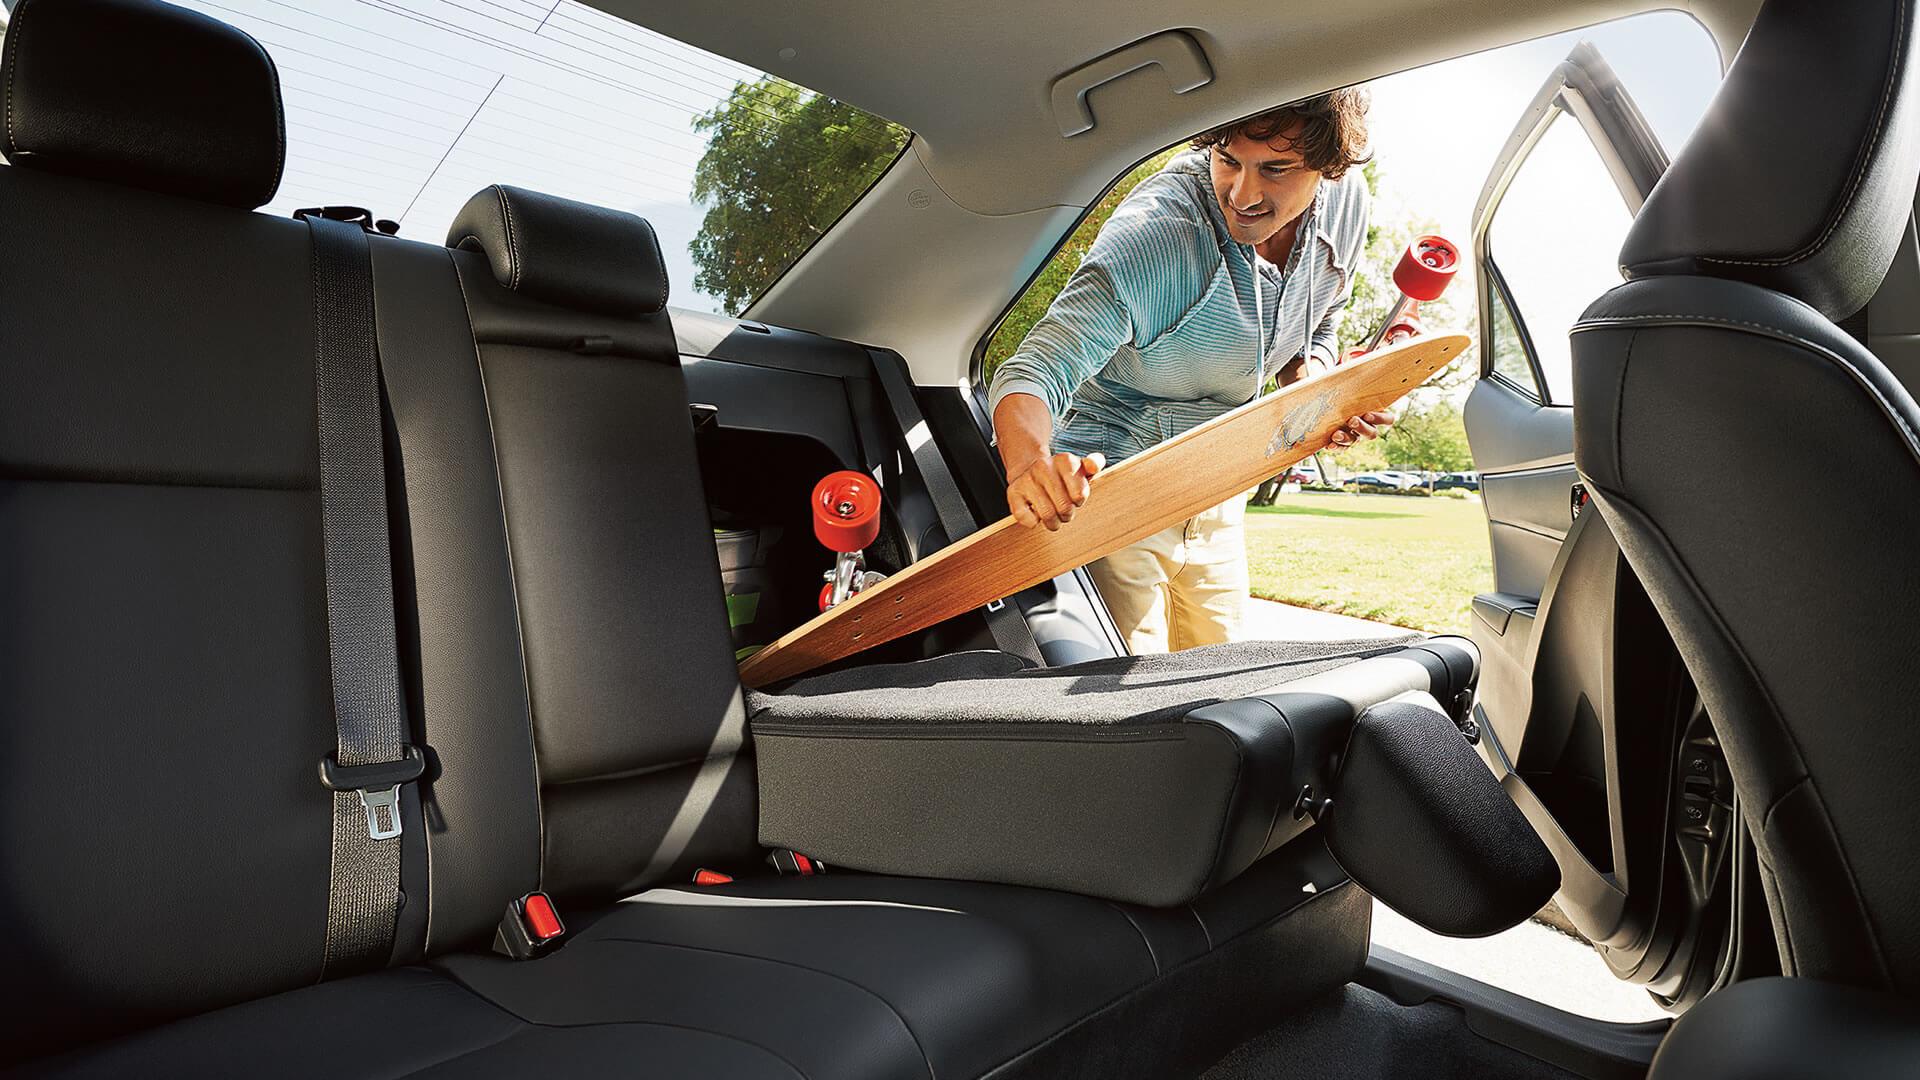 2016 Toyota Corolla interior features